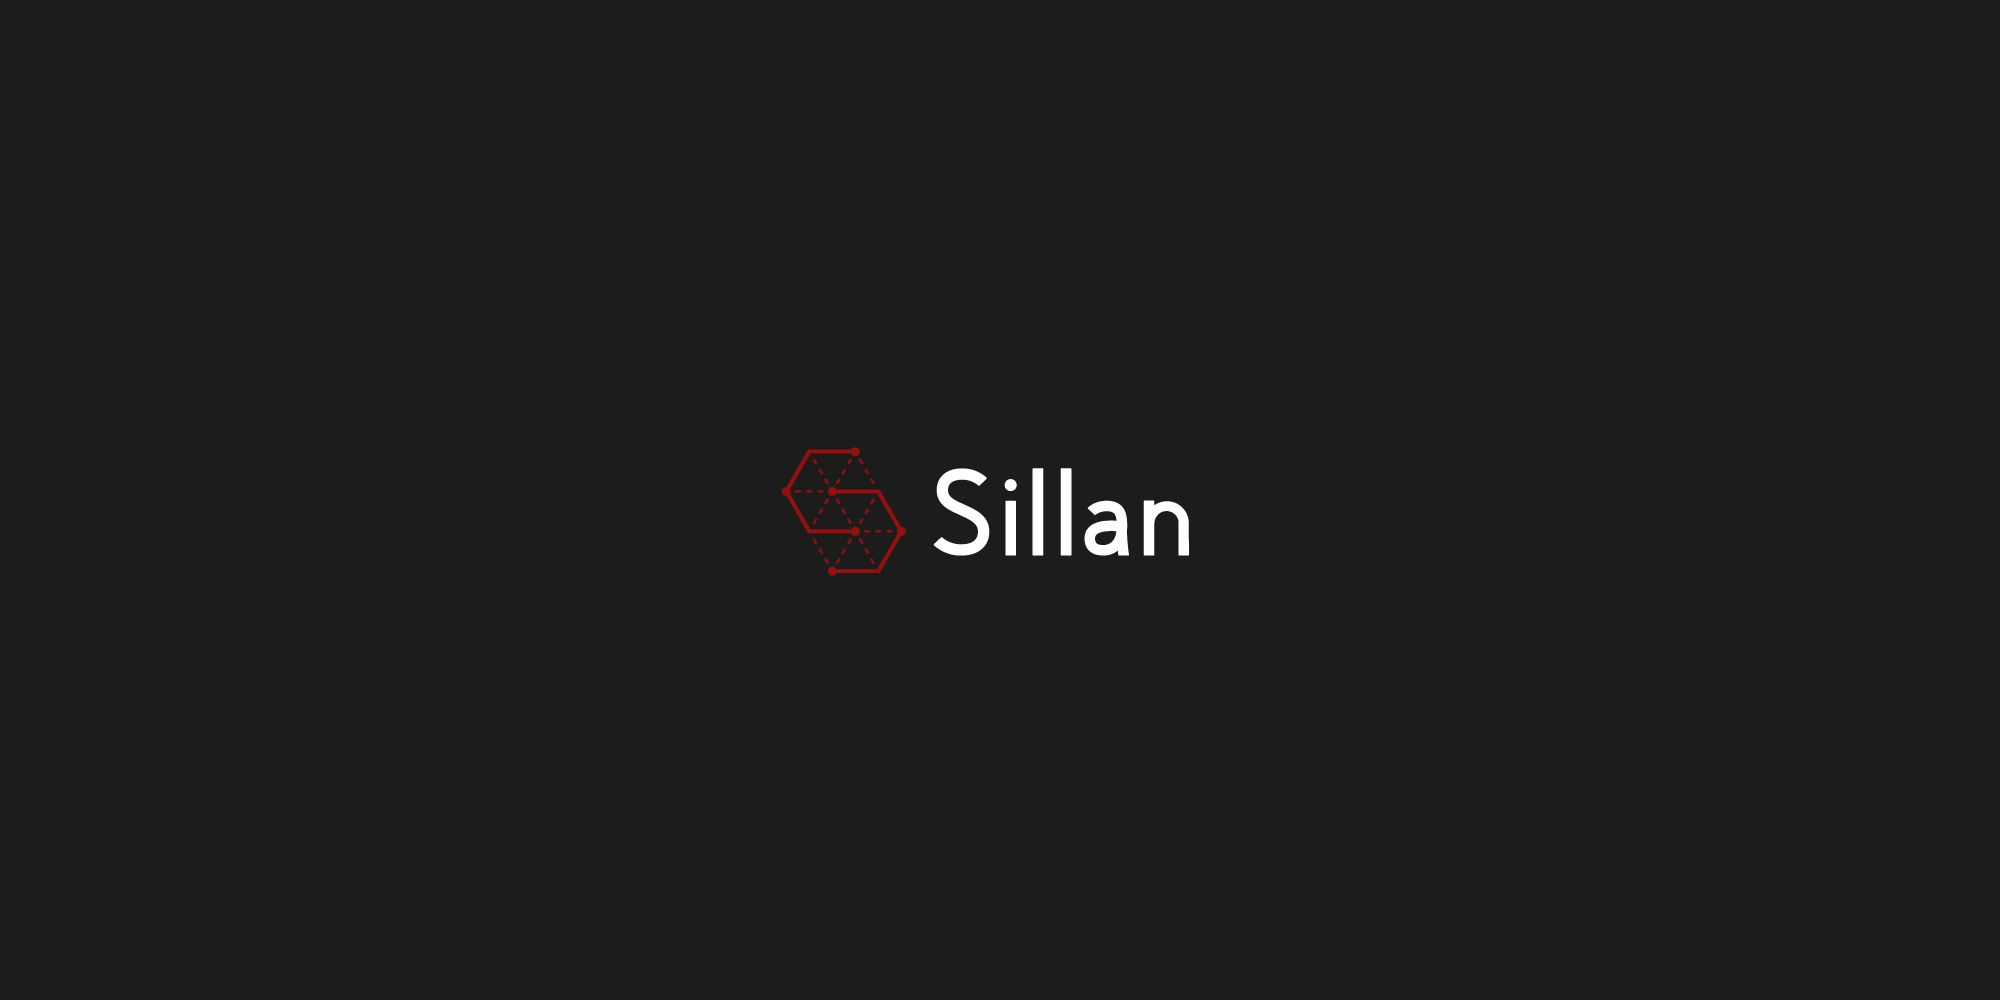 Логотип для Sillan - дизайнер B7Design